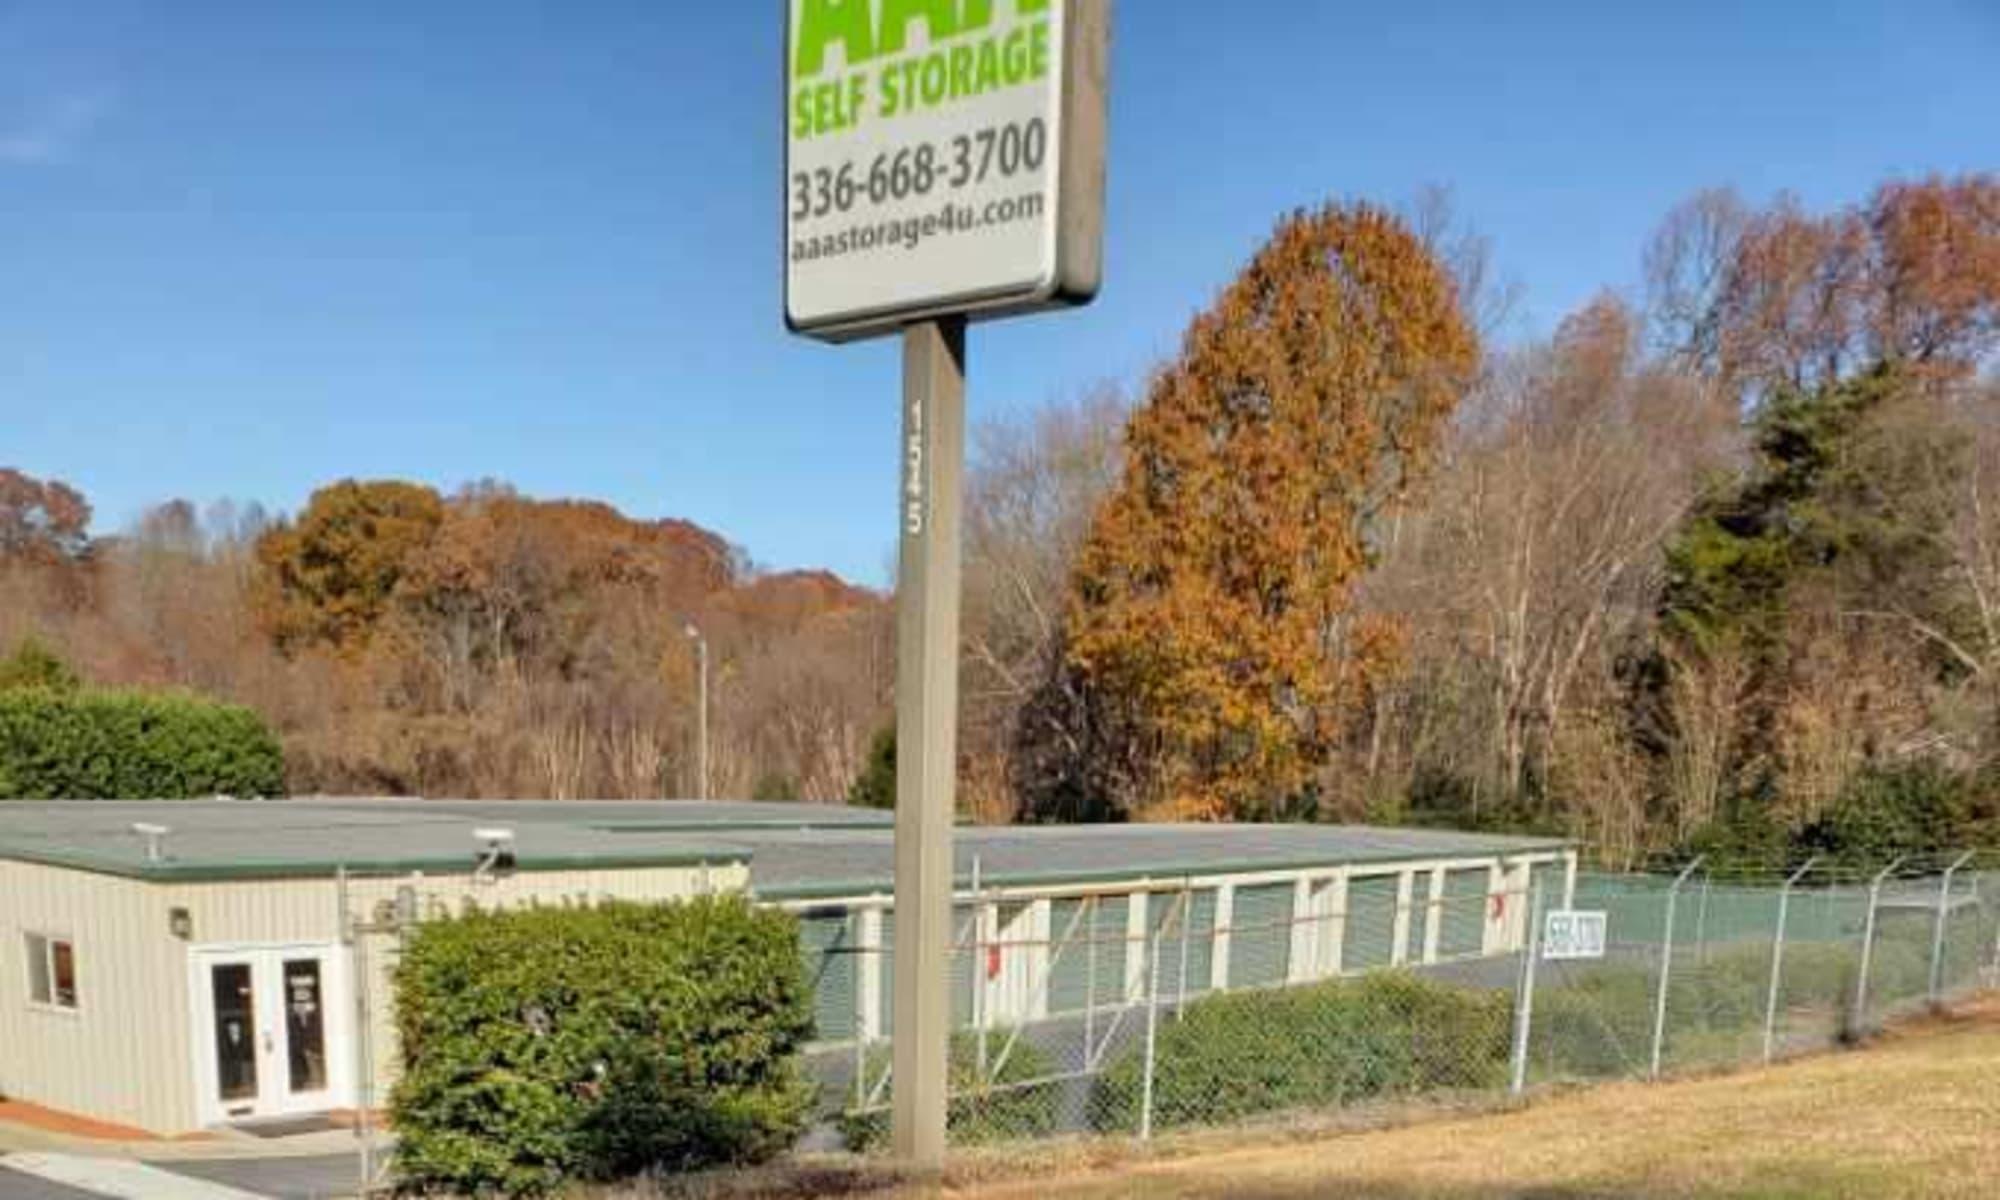 Self Storage at AAA Self Storage at Pleasant Ridge Rd in Greensboro, North Carolina.